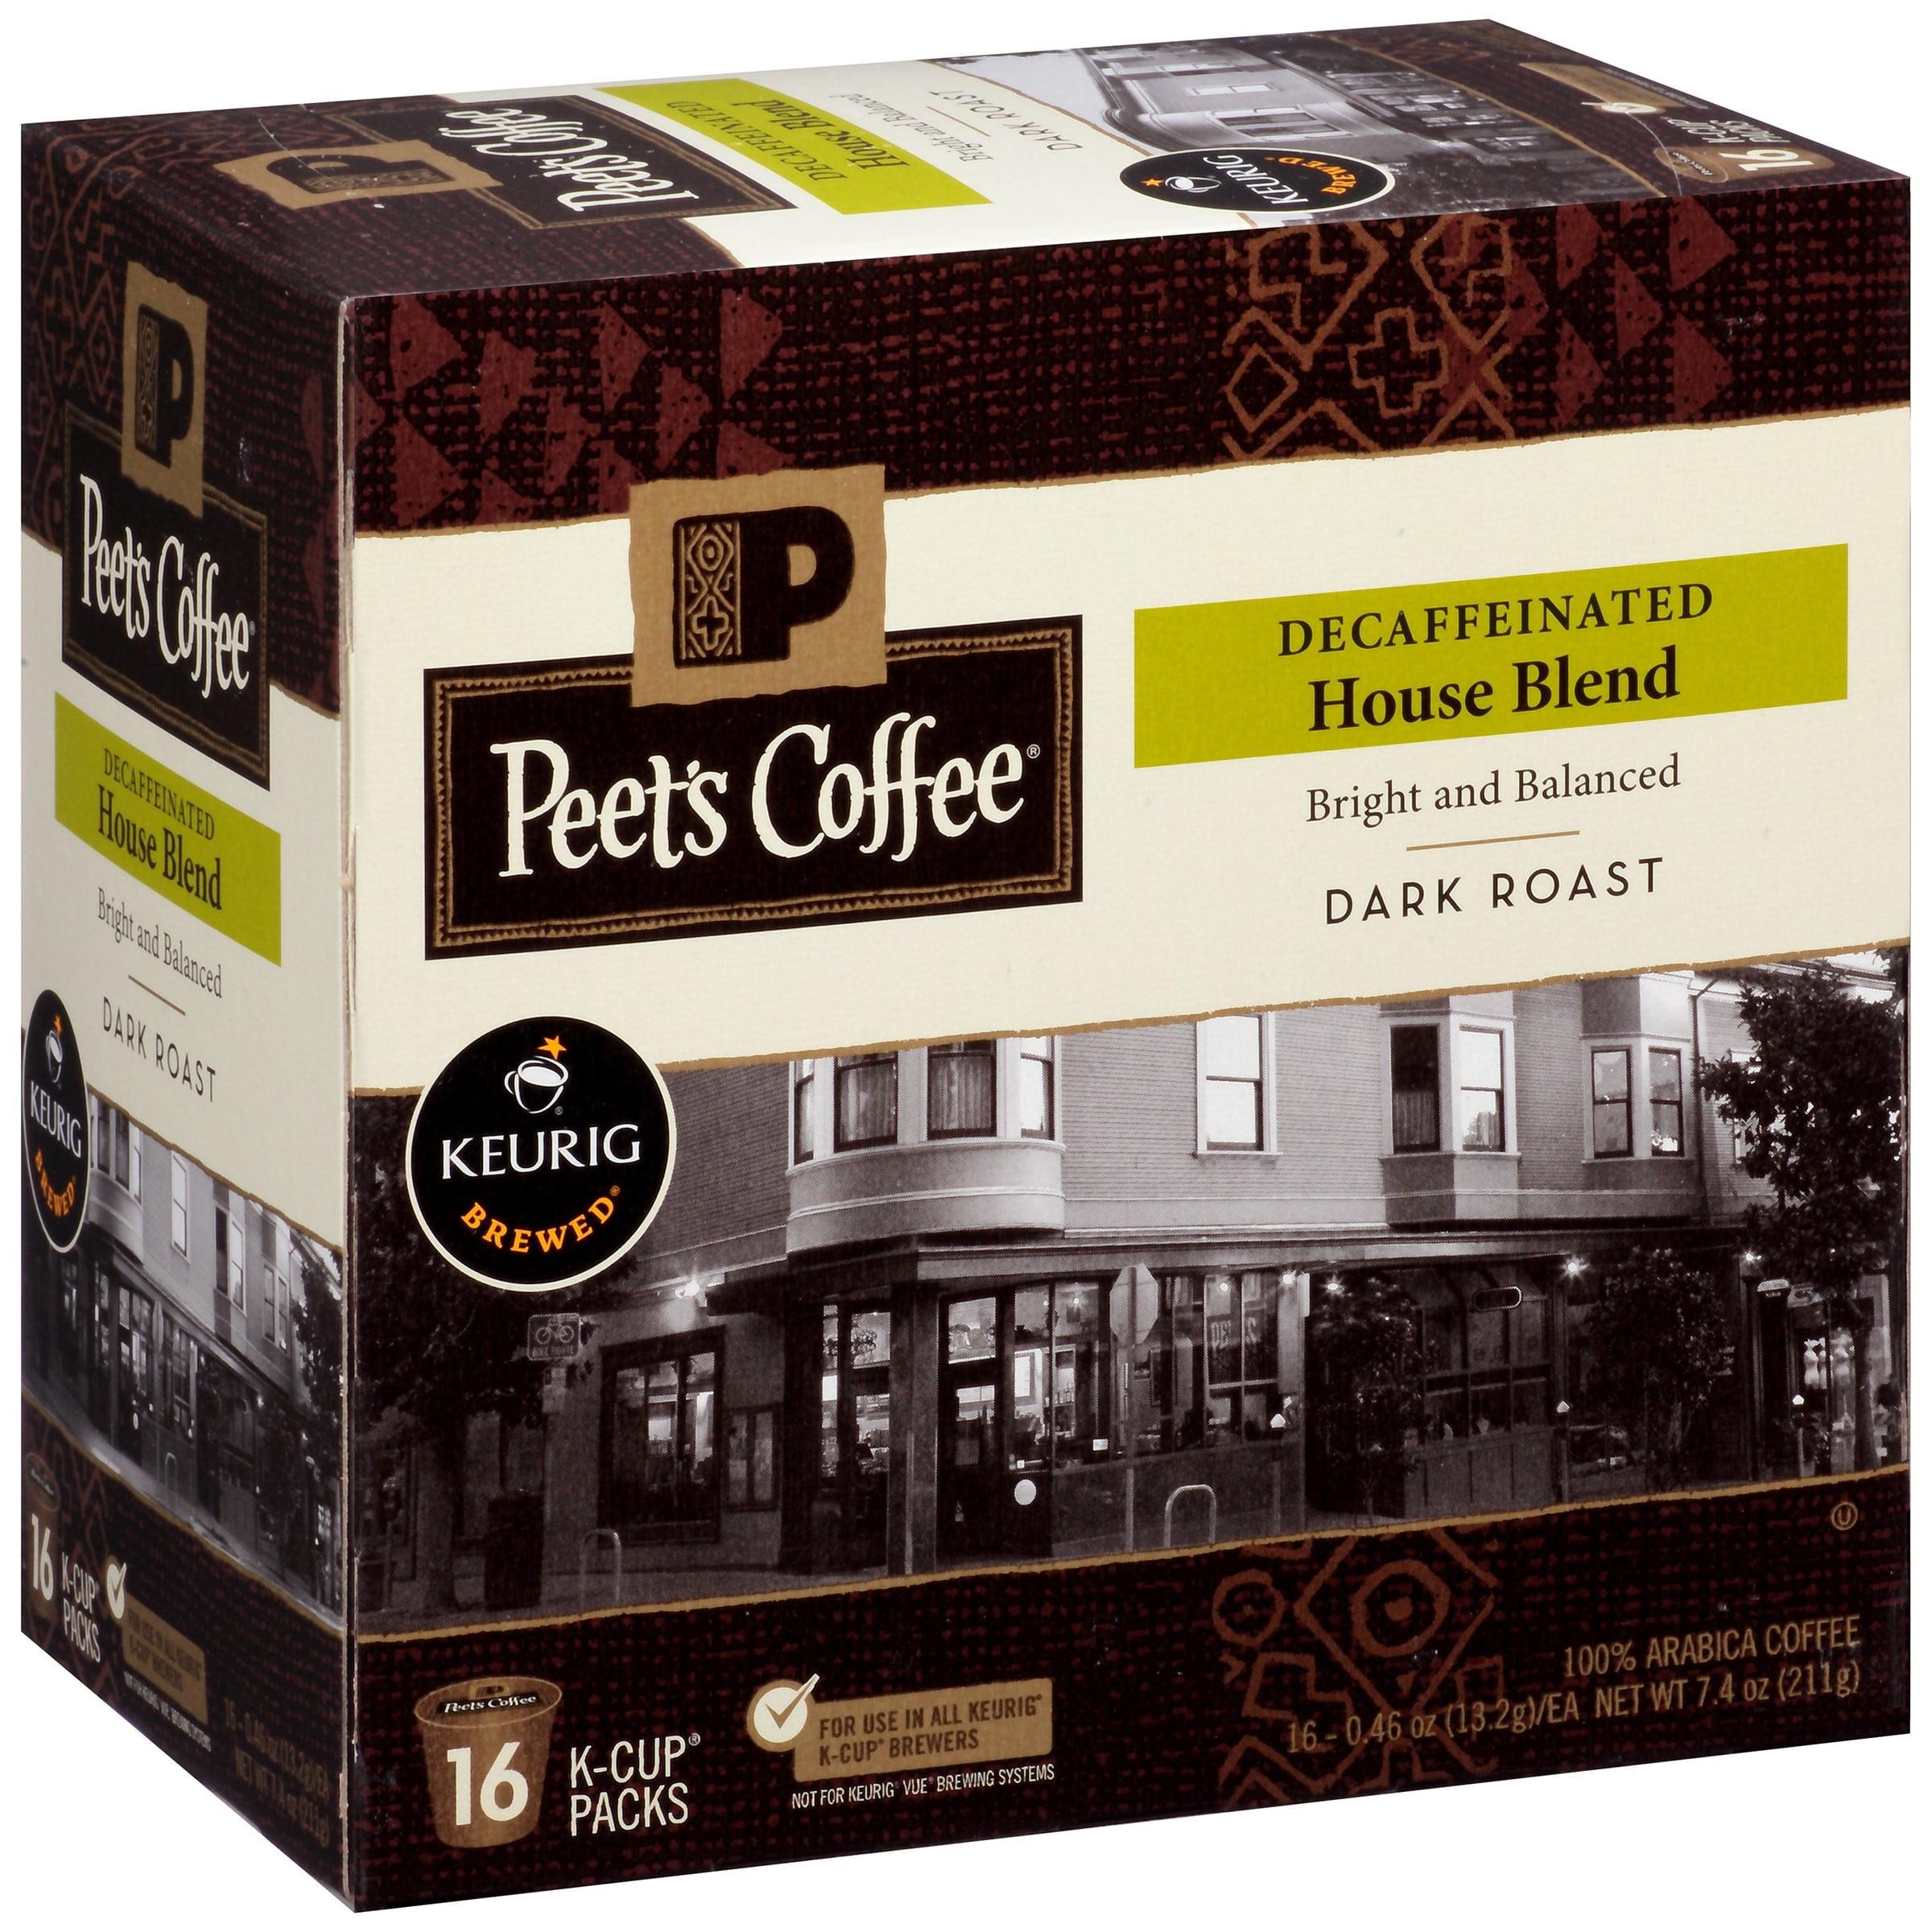 Peet's Coffee Decaffeinated House Blend Dark Roast Coffee Pods, 16 pods